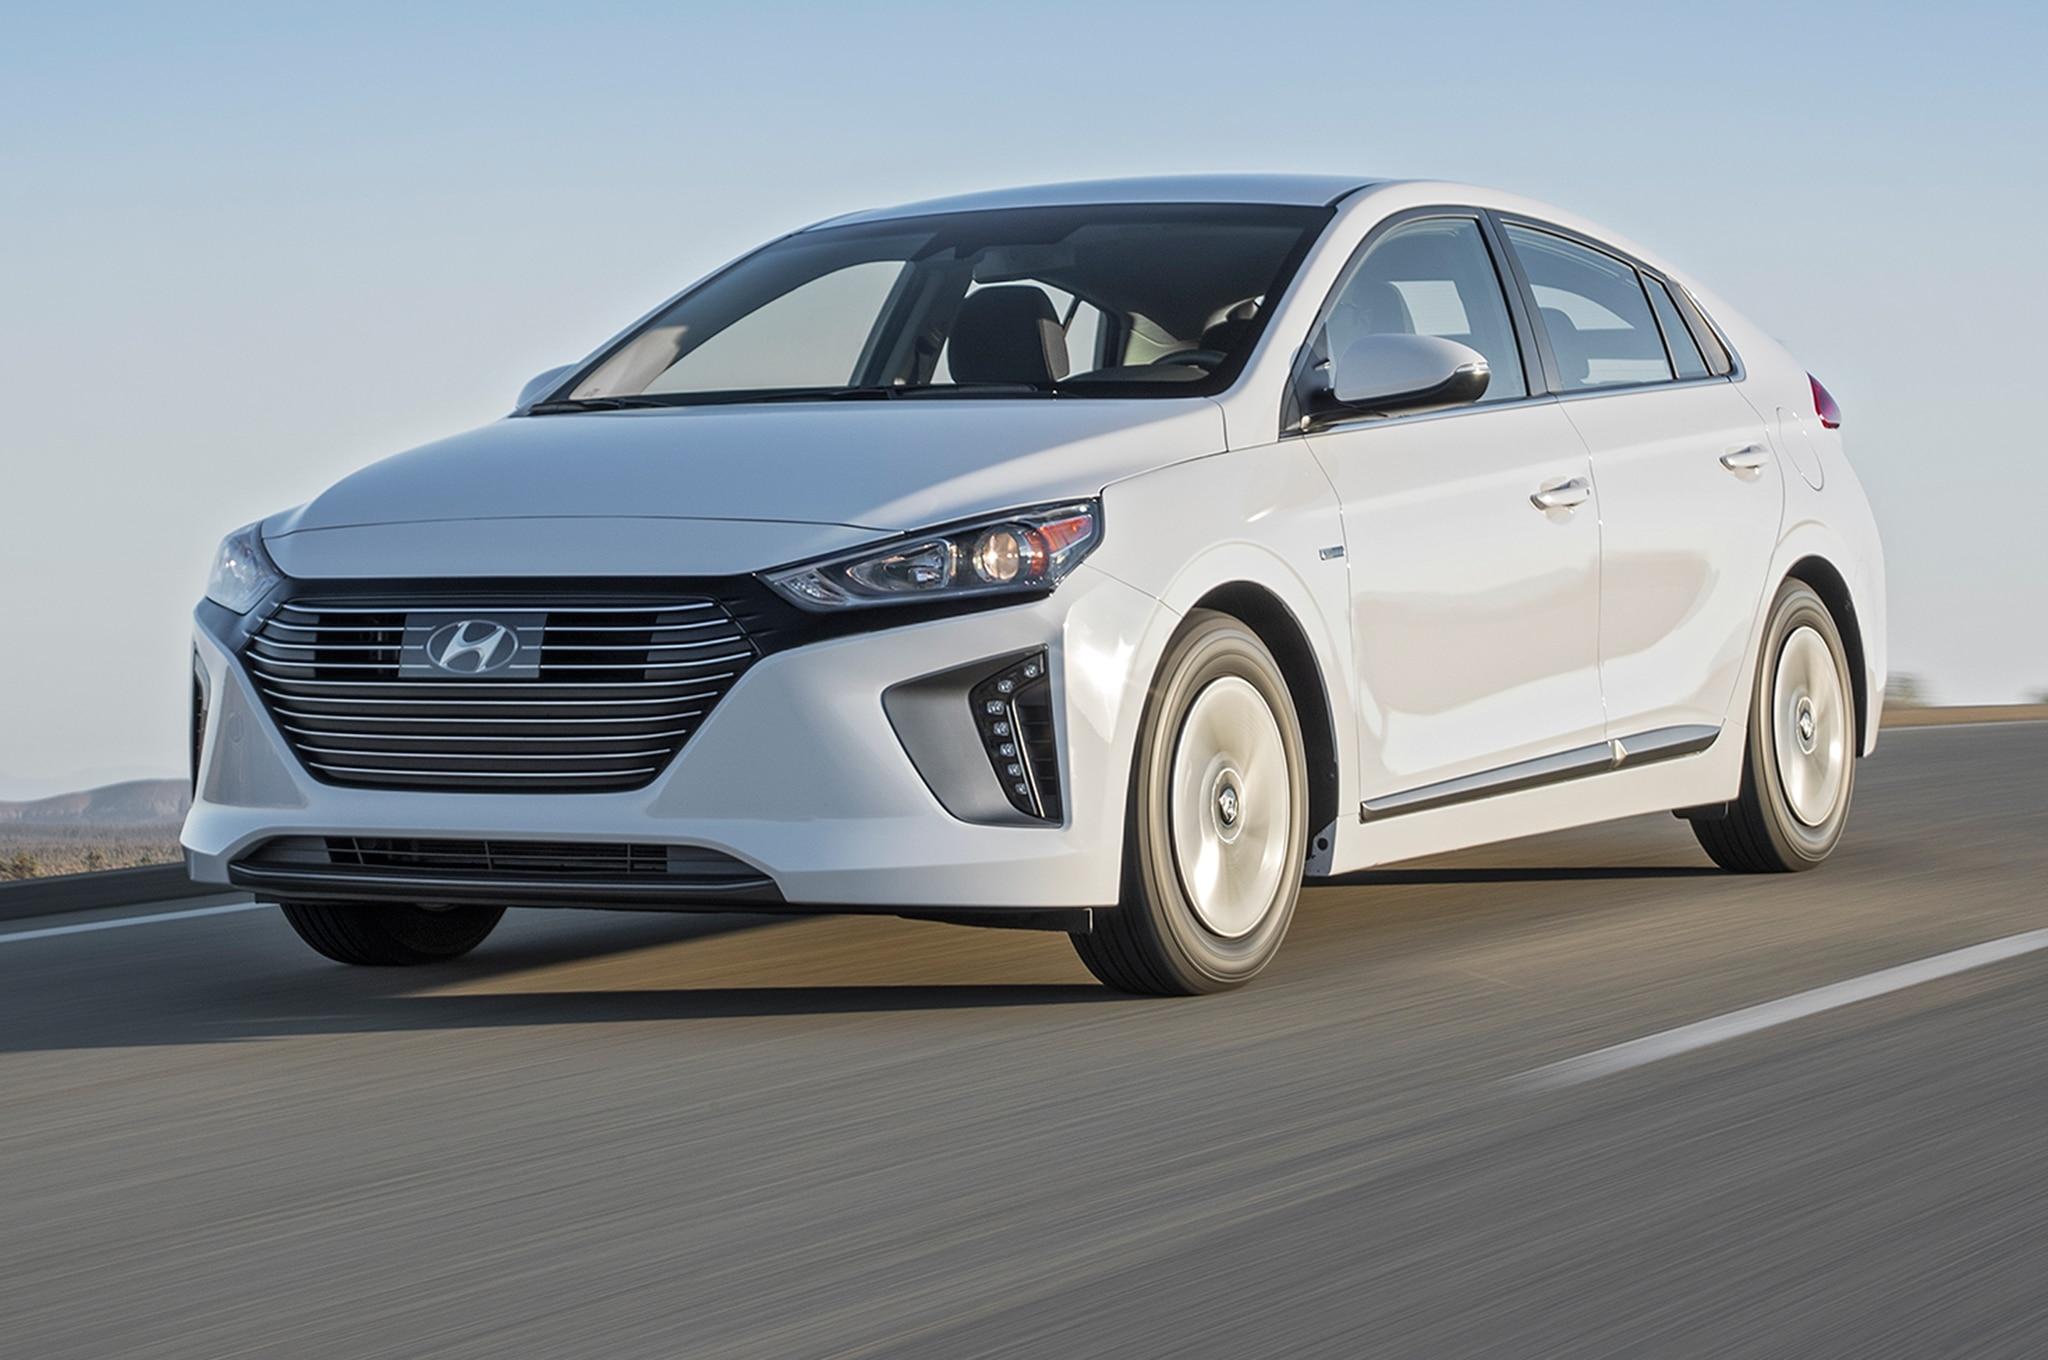 2017 Hyundai Ioniq Hybrid Front Three Quarter In Motion 00